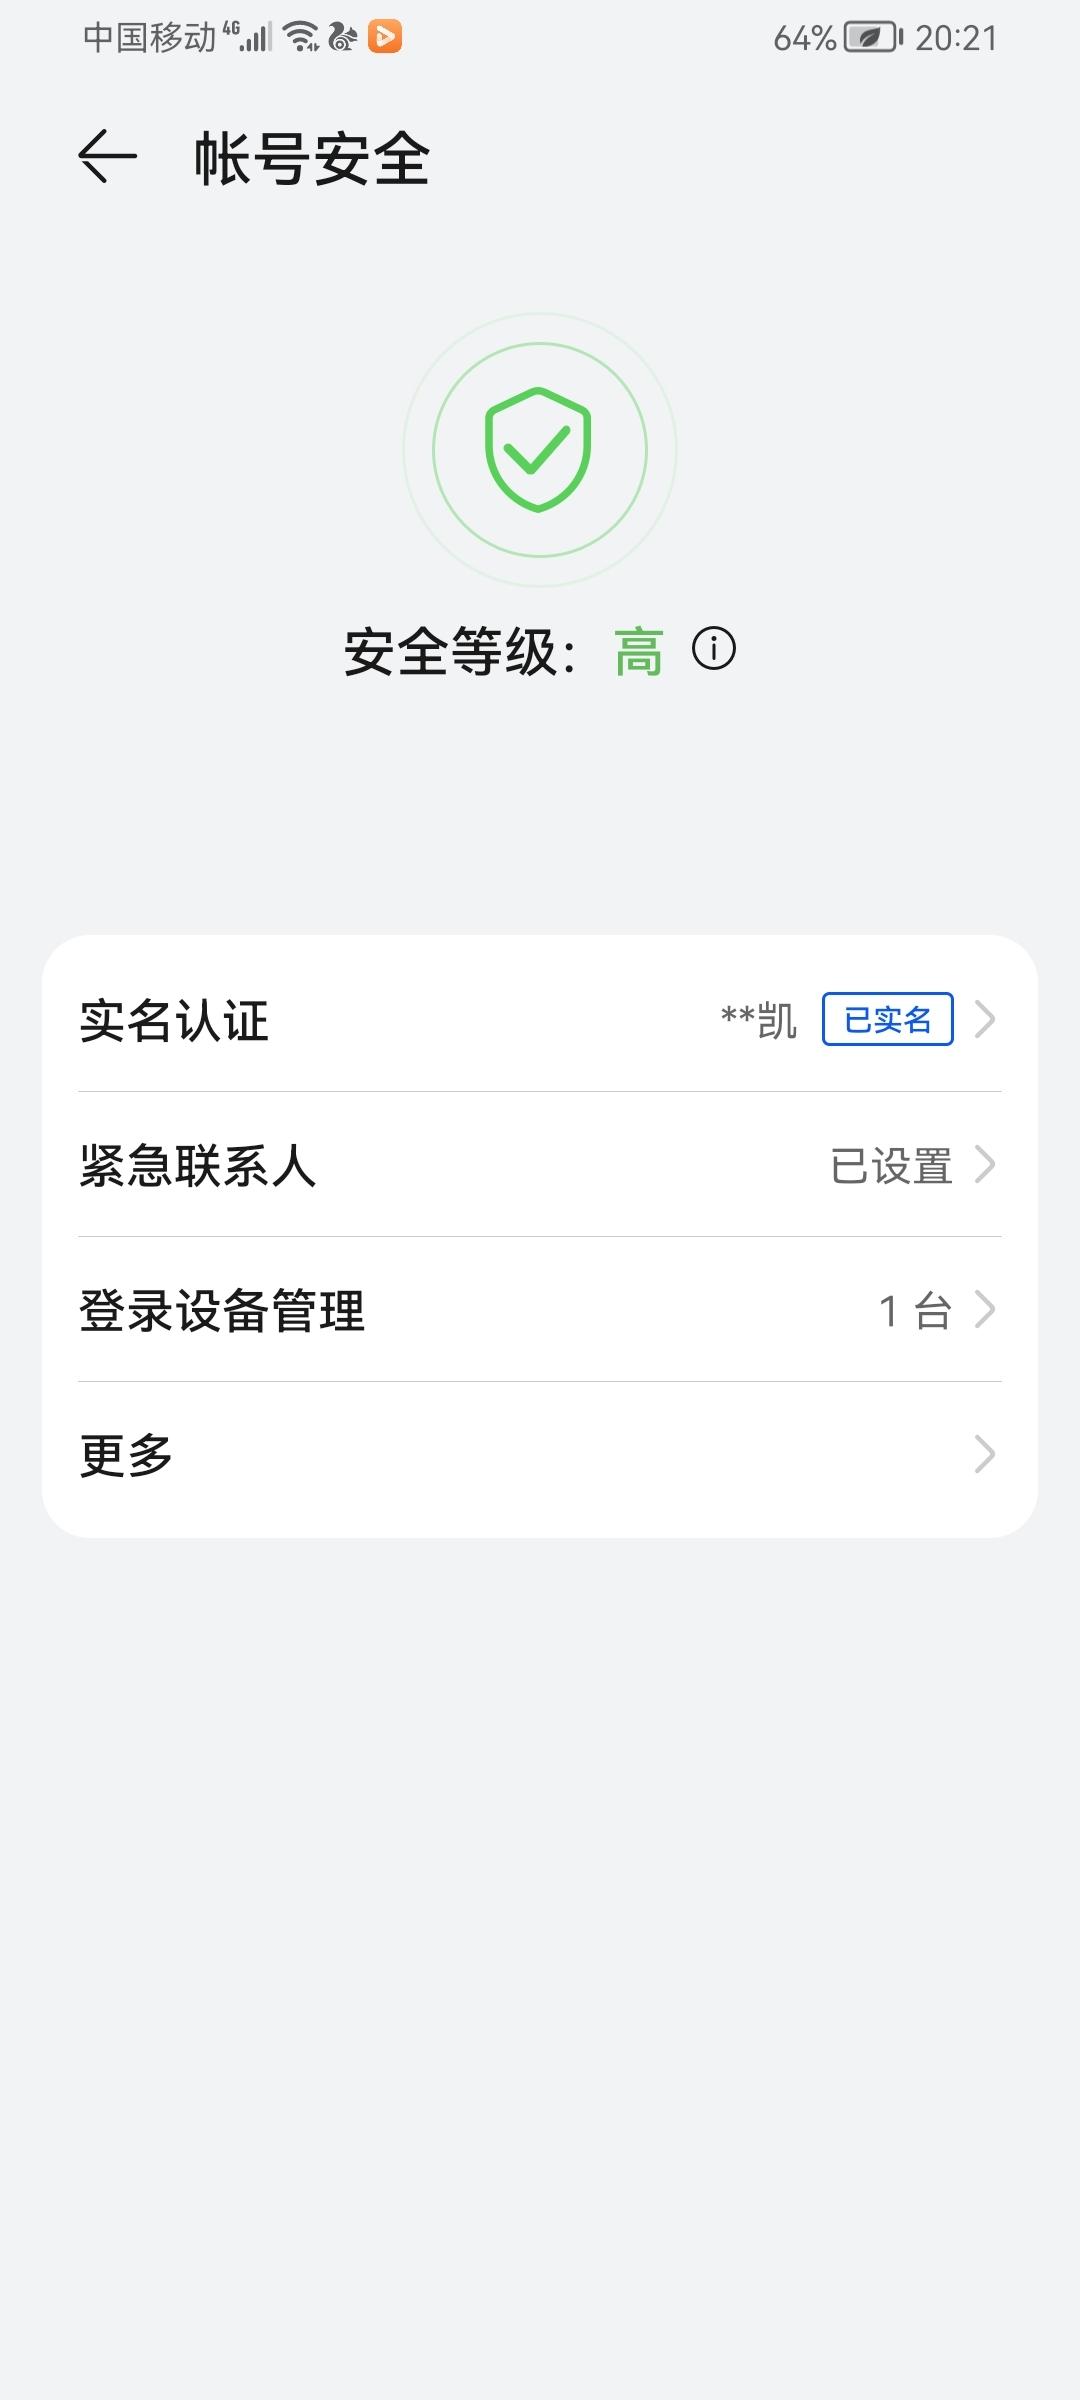 Screenshot_20210906_202121_com.huawei.hwid.jpg